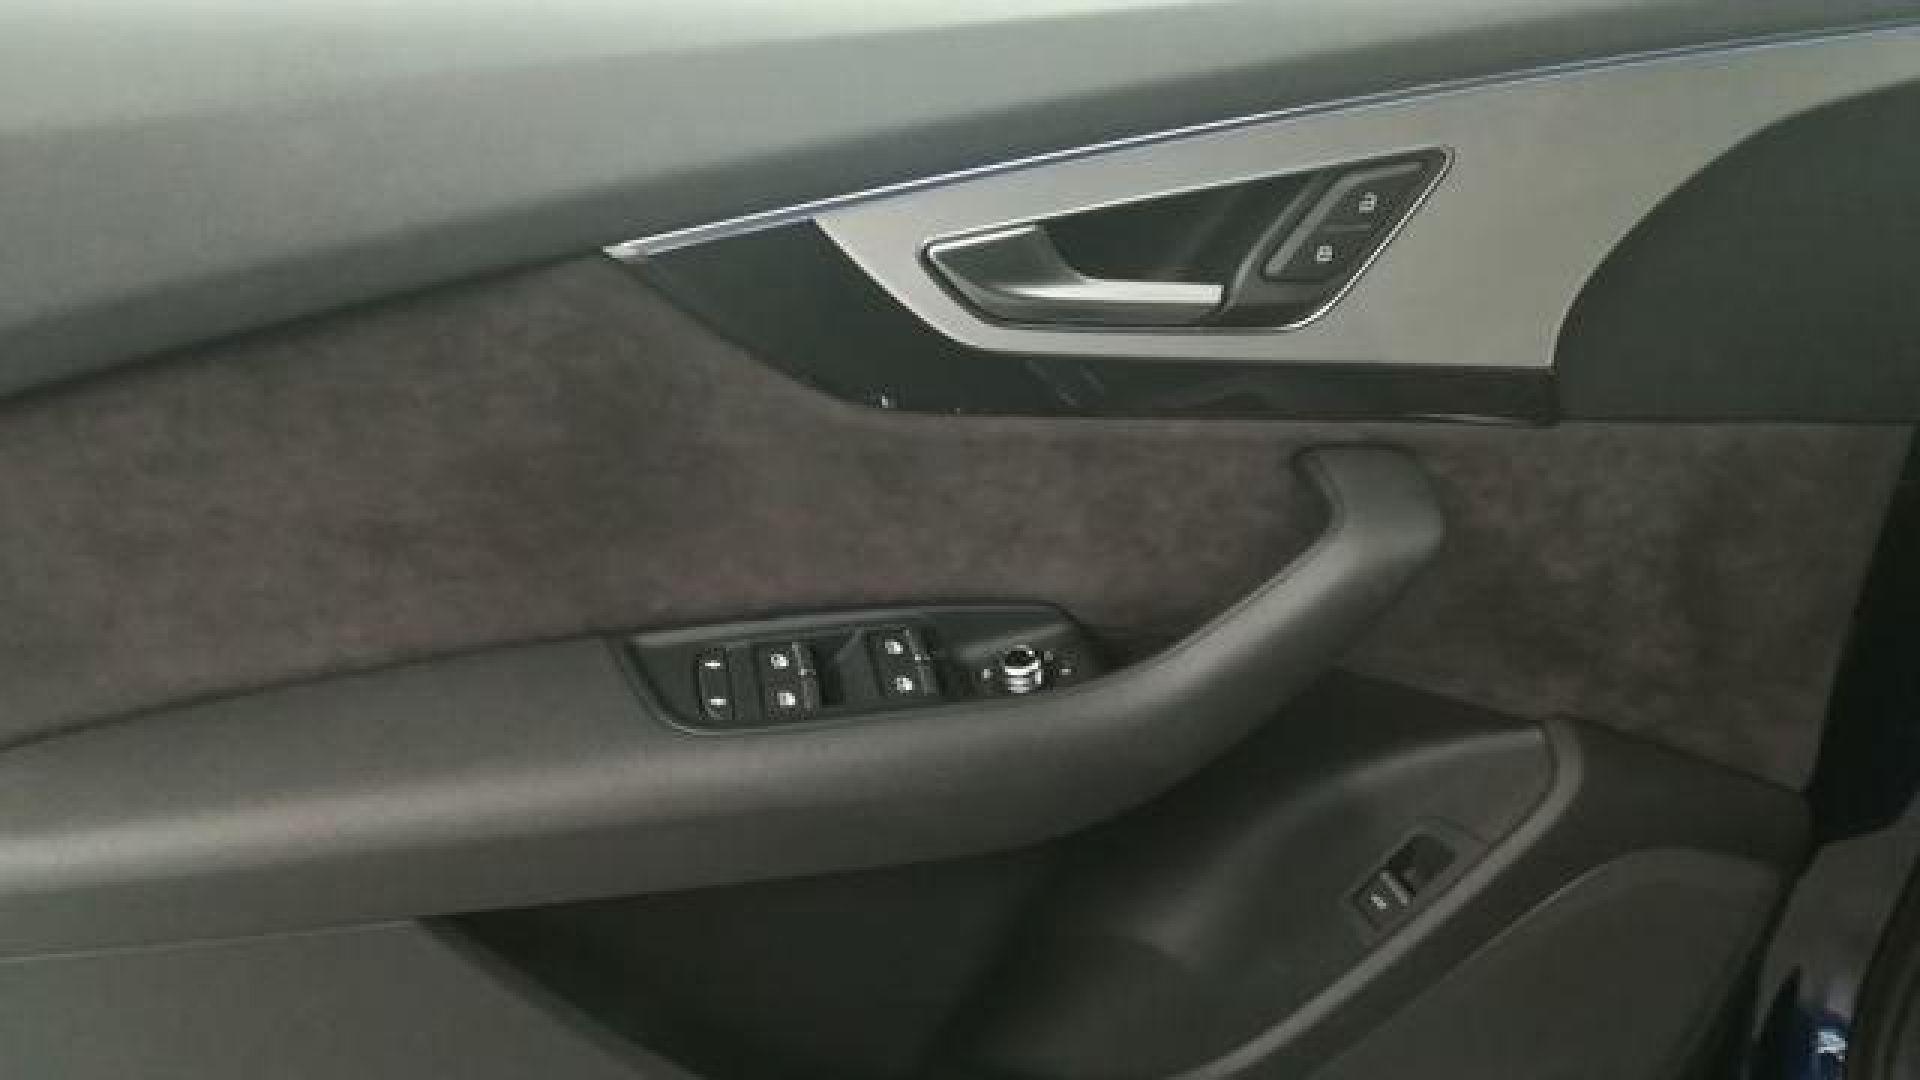 Audi Q7 Black line edition 3.0 TDI quattro 200 kW (272 CV) tiptronic